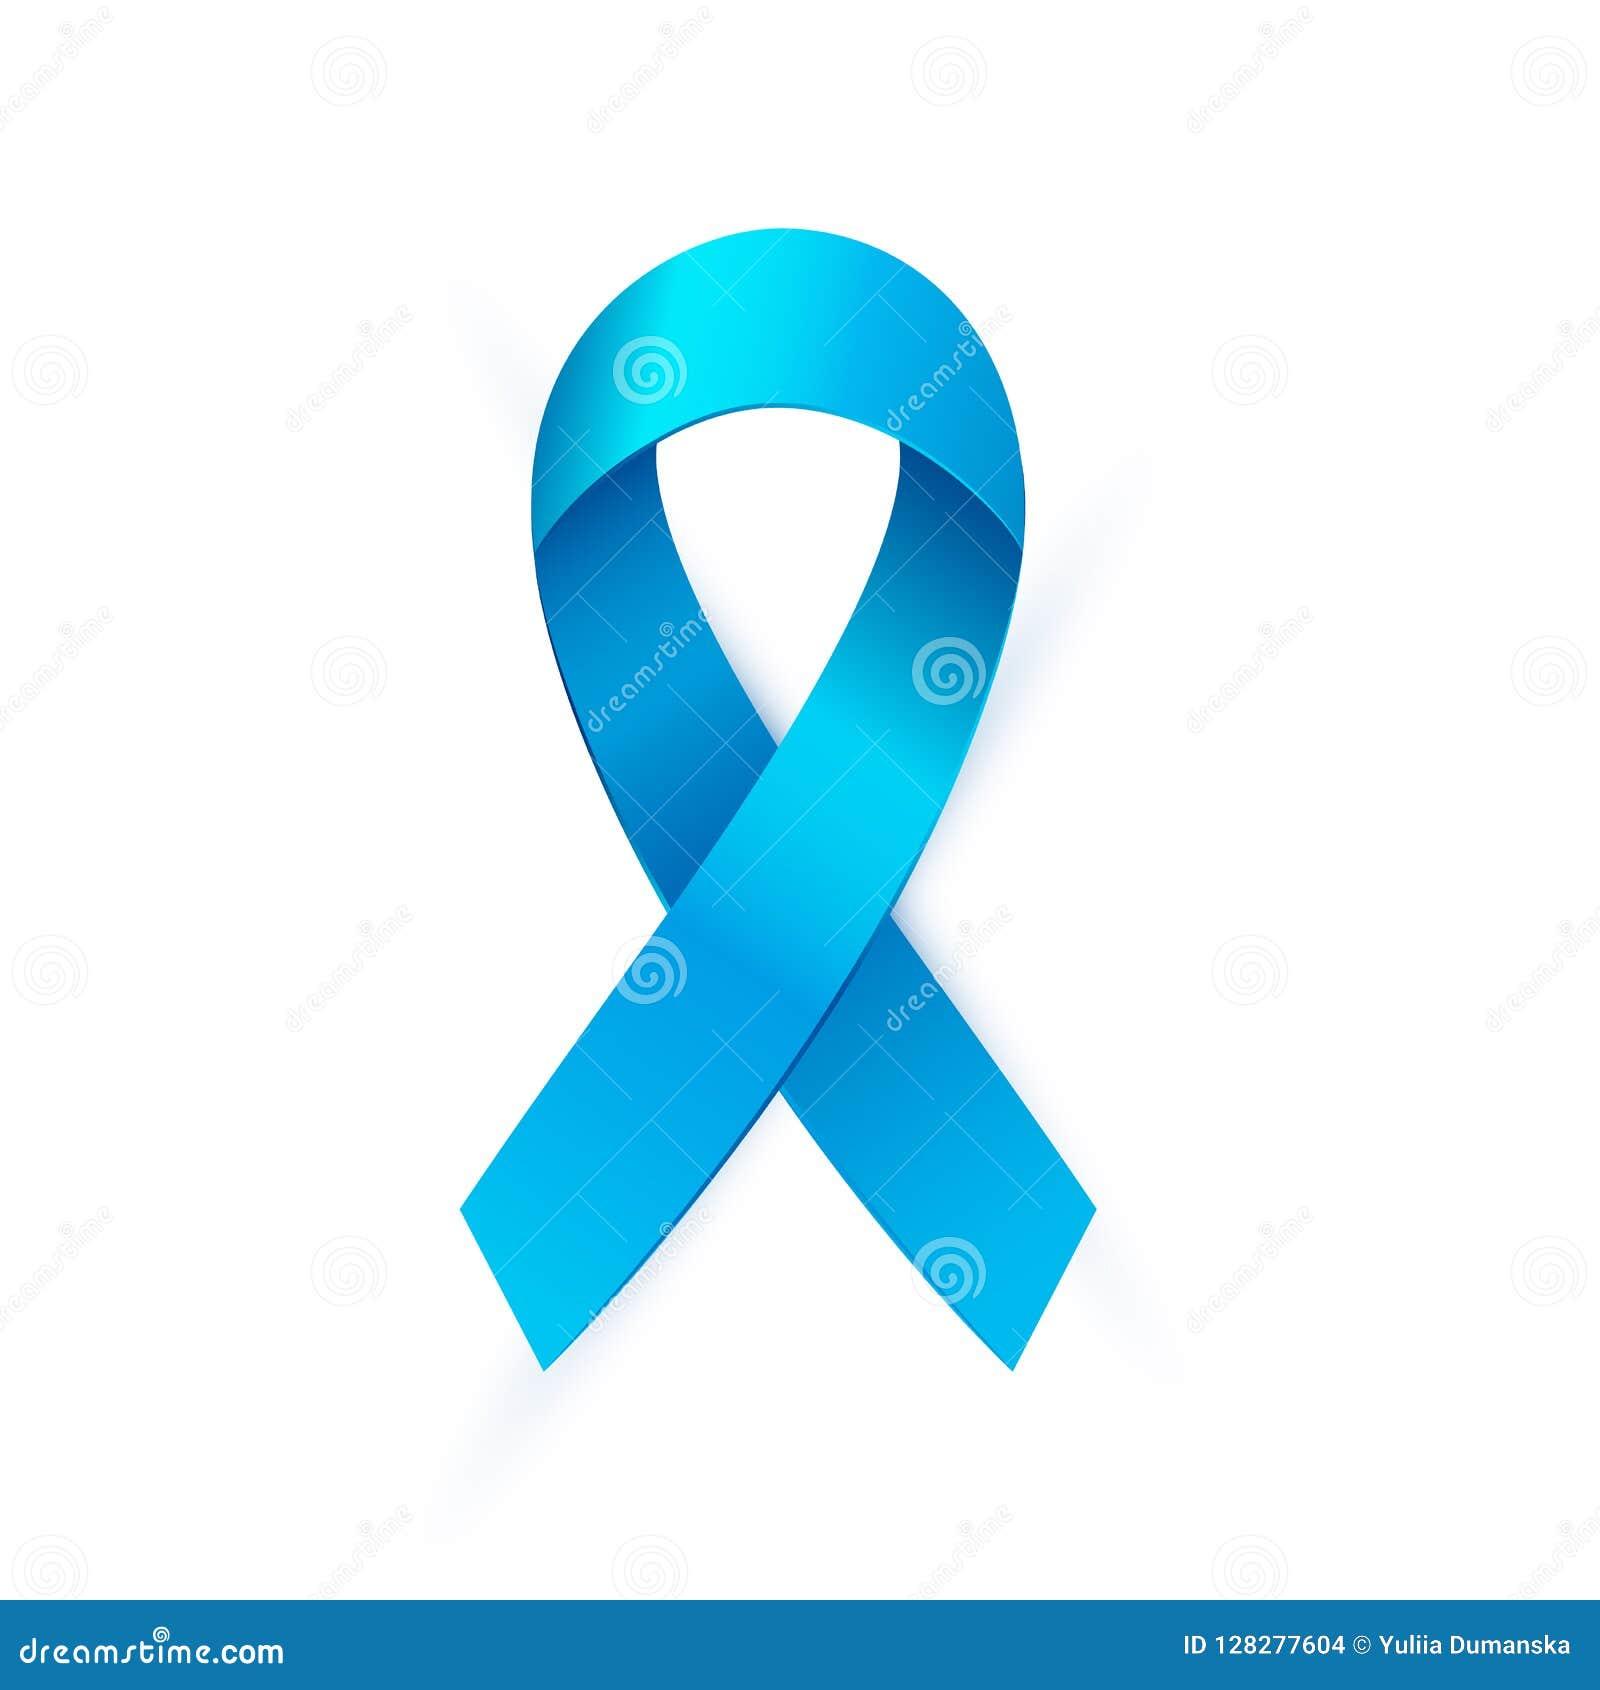 centros de próstata venecianos 2020